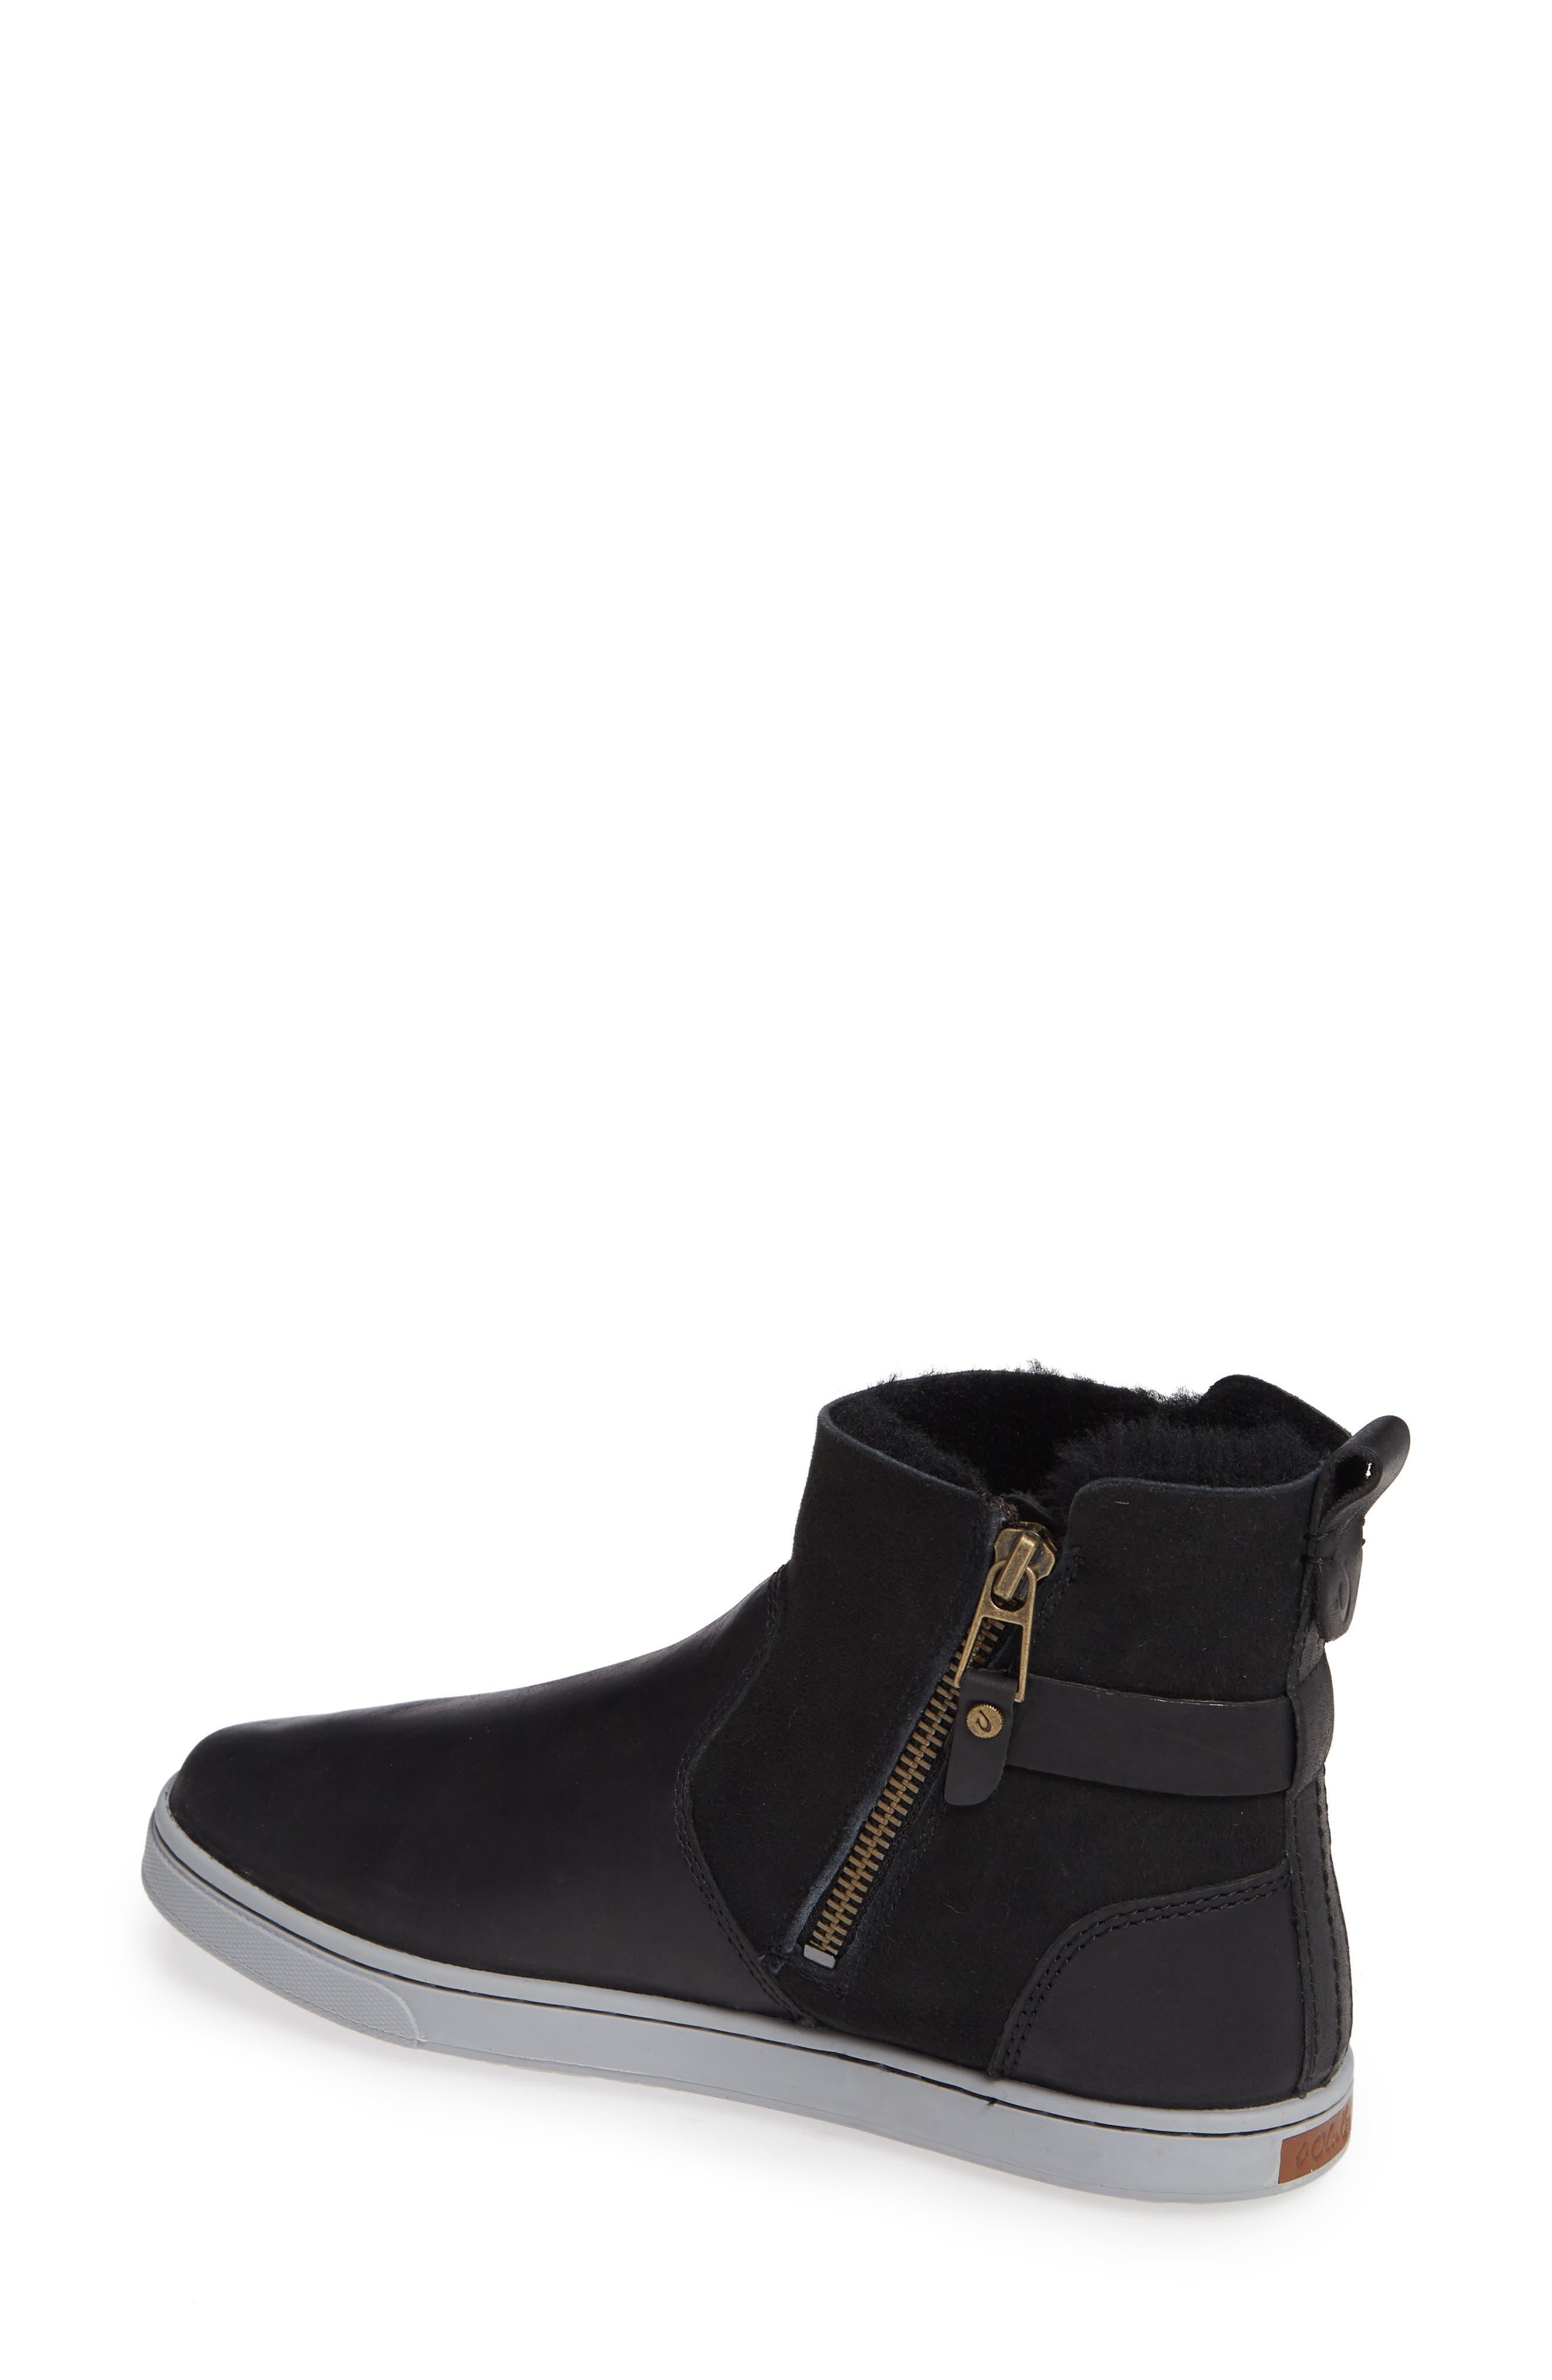 Pehuea Pa'I Genuine Shearling Sneaker Boot,                             Alternate thumbnail 2, color,                             BLACK/ BLACK LEATHER